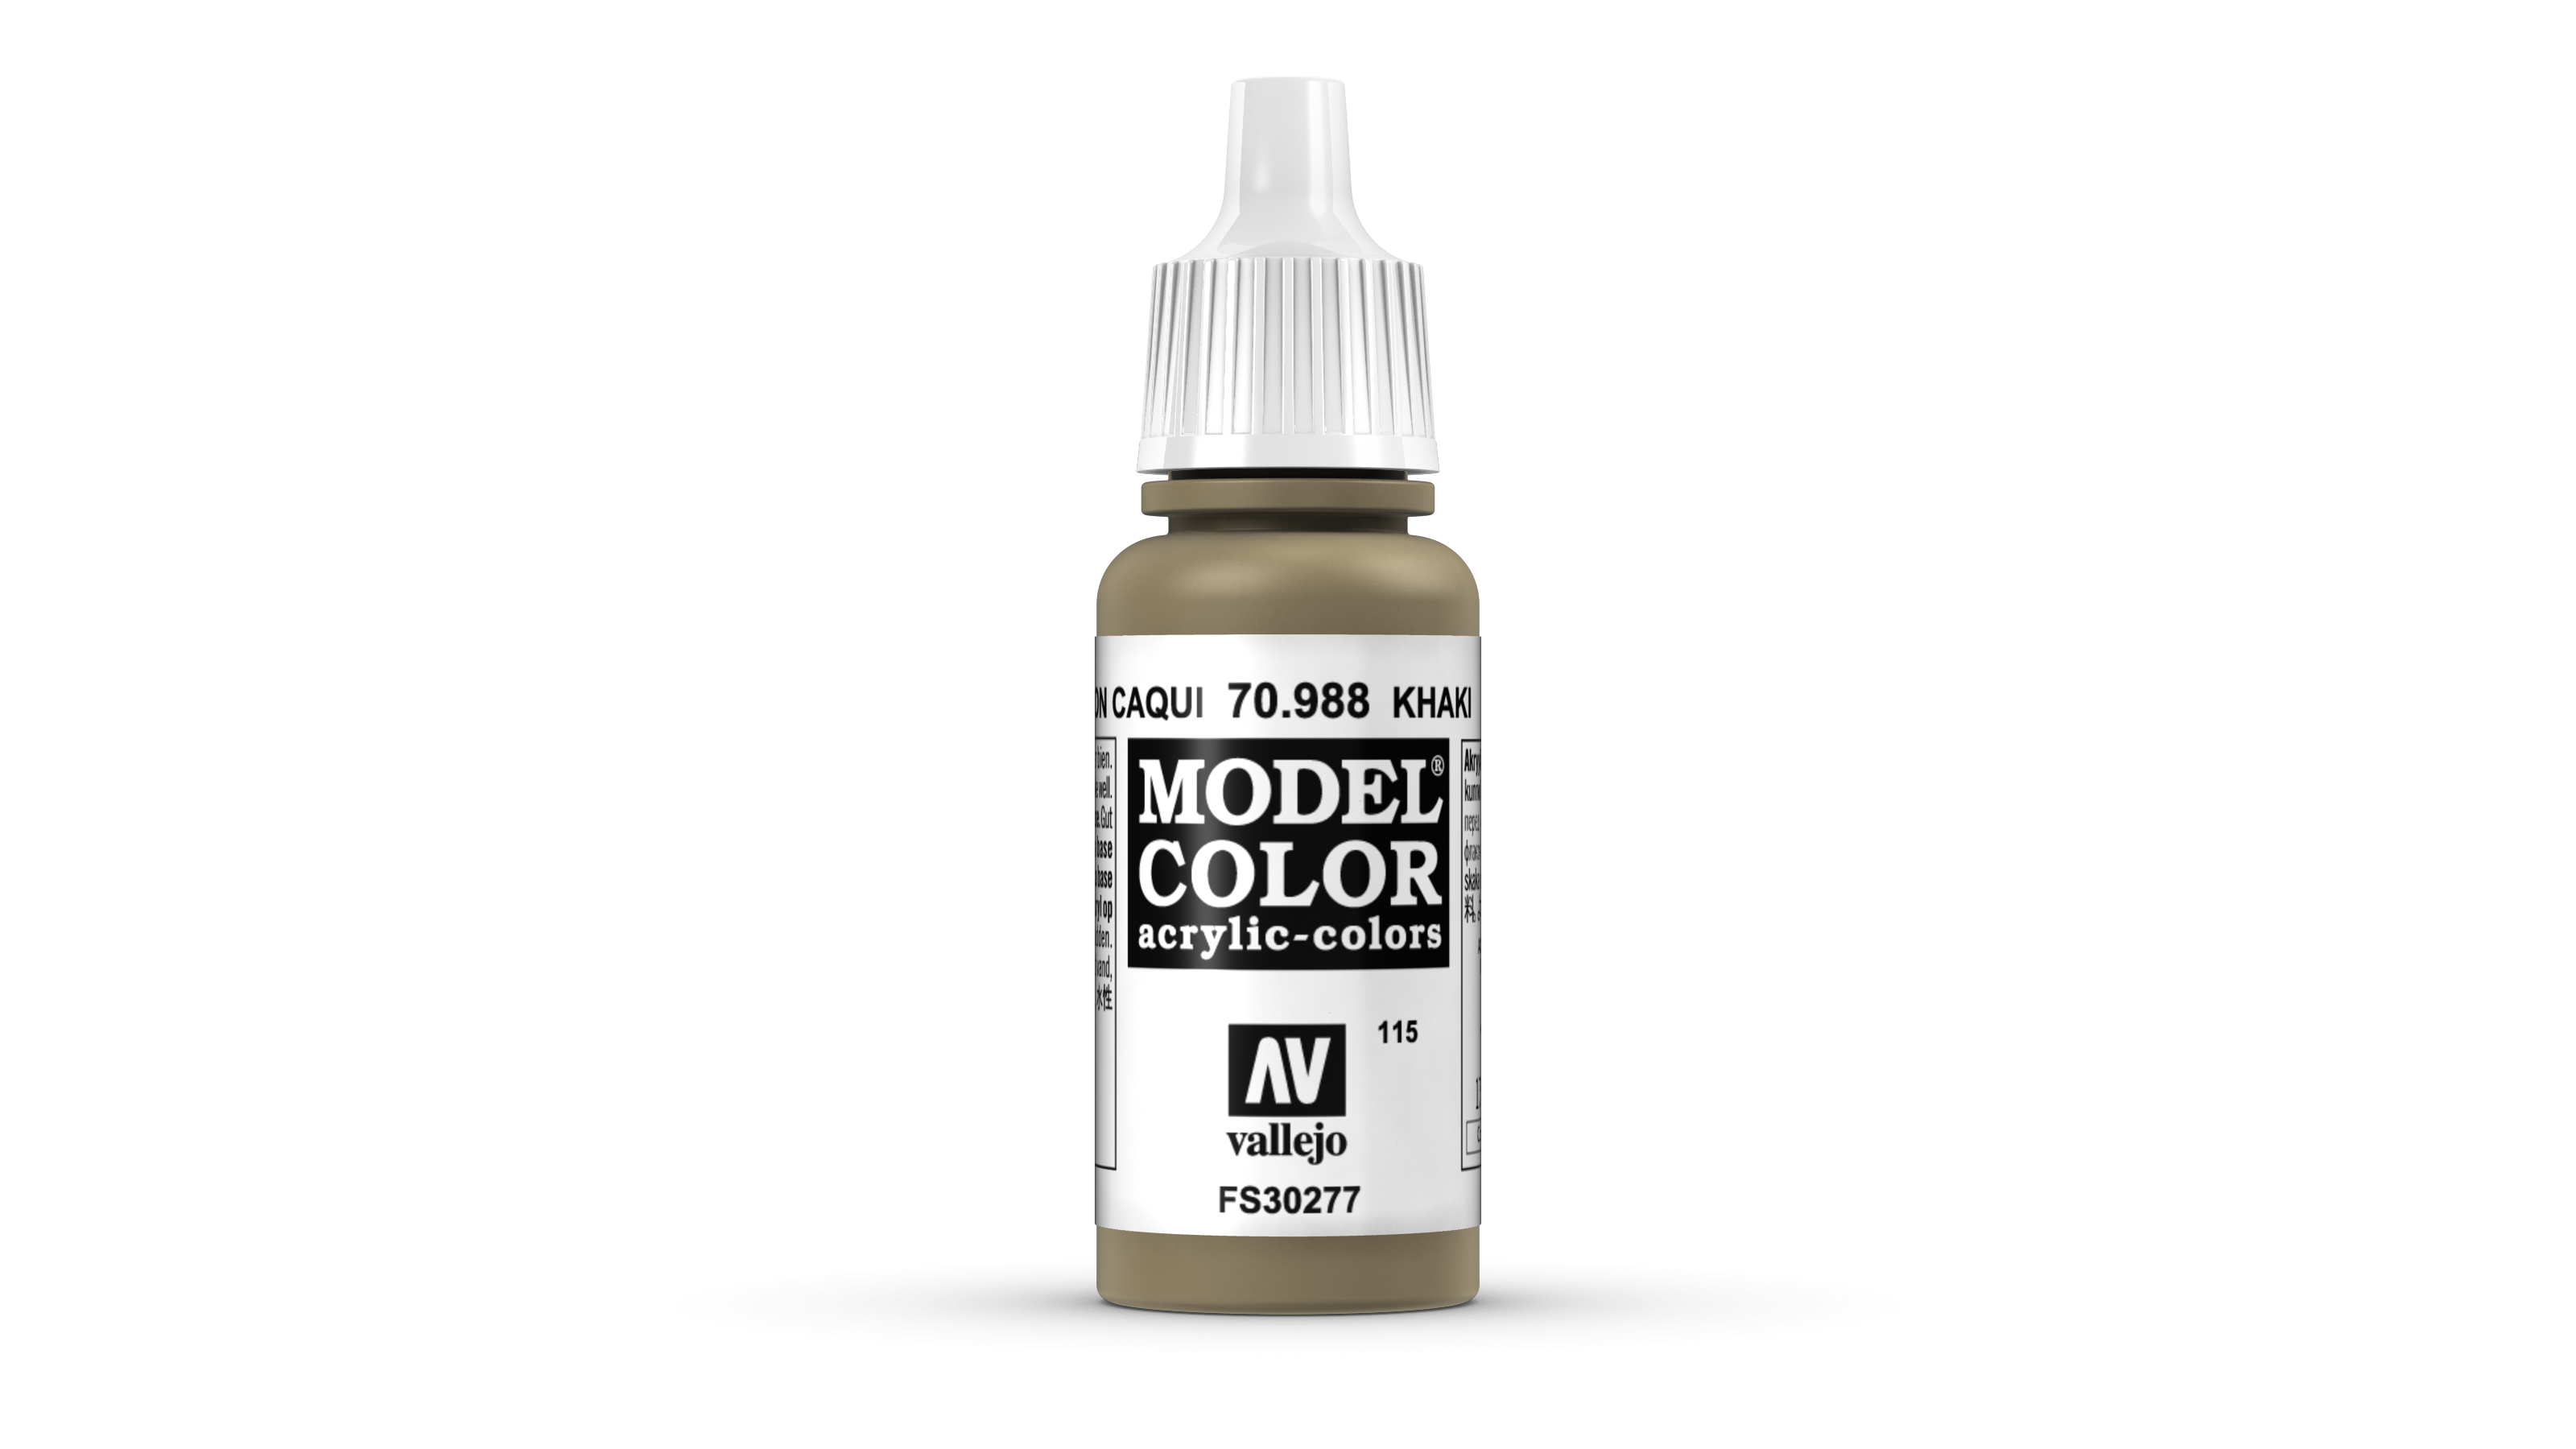 Model color - Khaki